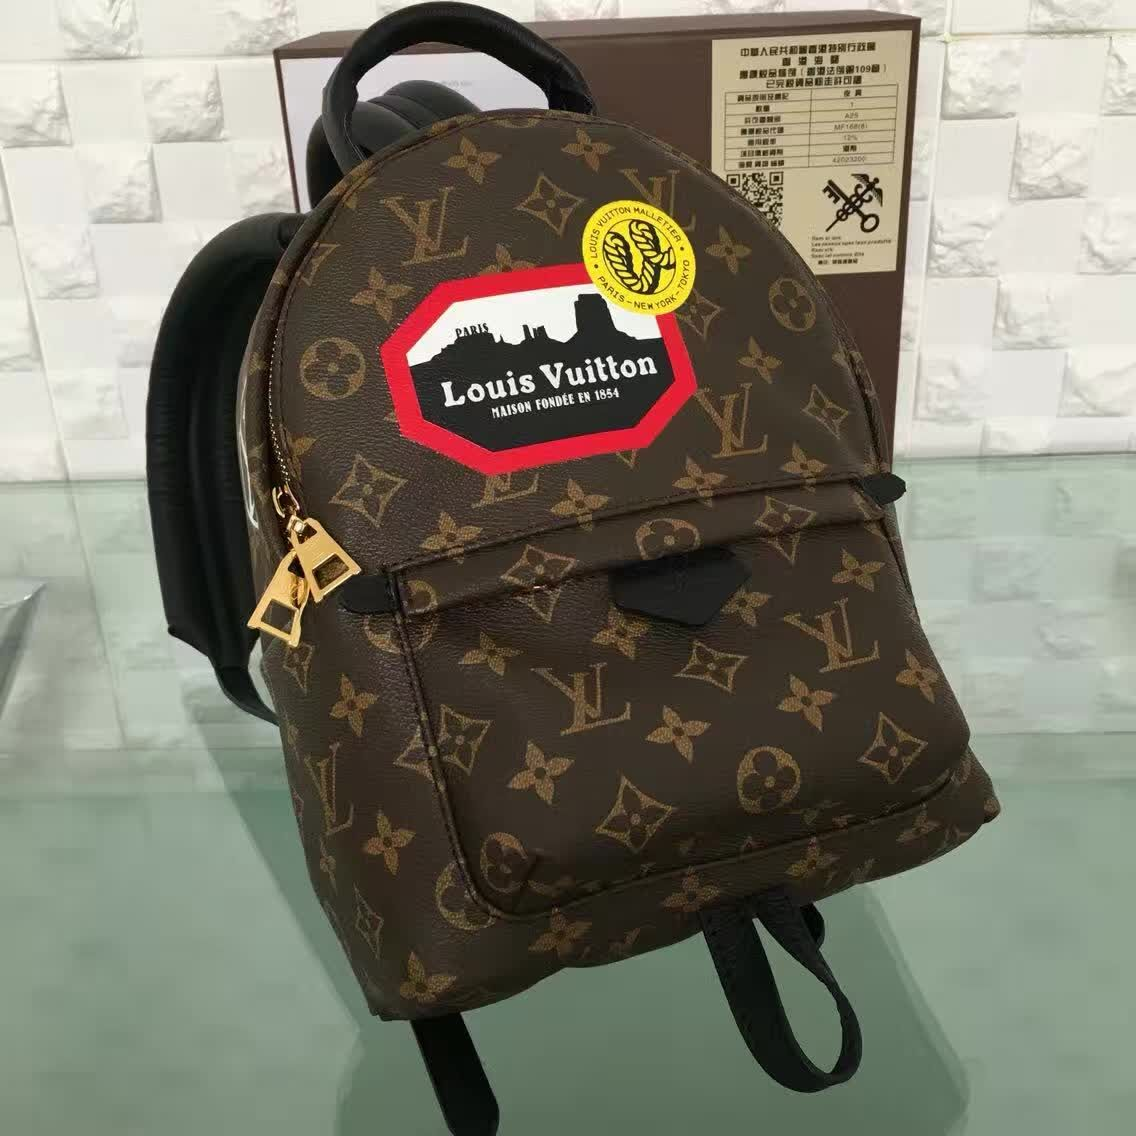 louis vuitton Backpack, ID : 64486(FORSALE:a@yybags.com), louis vuitton custom backpacks, louis vuitton buy wallets online, louis vuitton handbags for cheap, louis vuitton cheap handbags online, louis vuitton mens attache case, duplicate louis vuitton bags, louis vuitton hunting backpacks, store louis vuitton, handbag louis #louisvuittonBackpack #louisvuitton #vuitton #bags